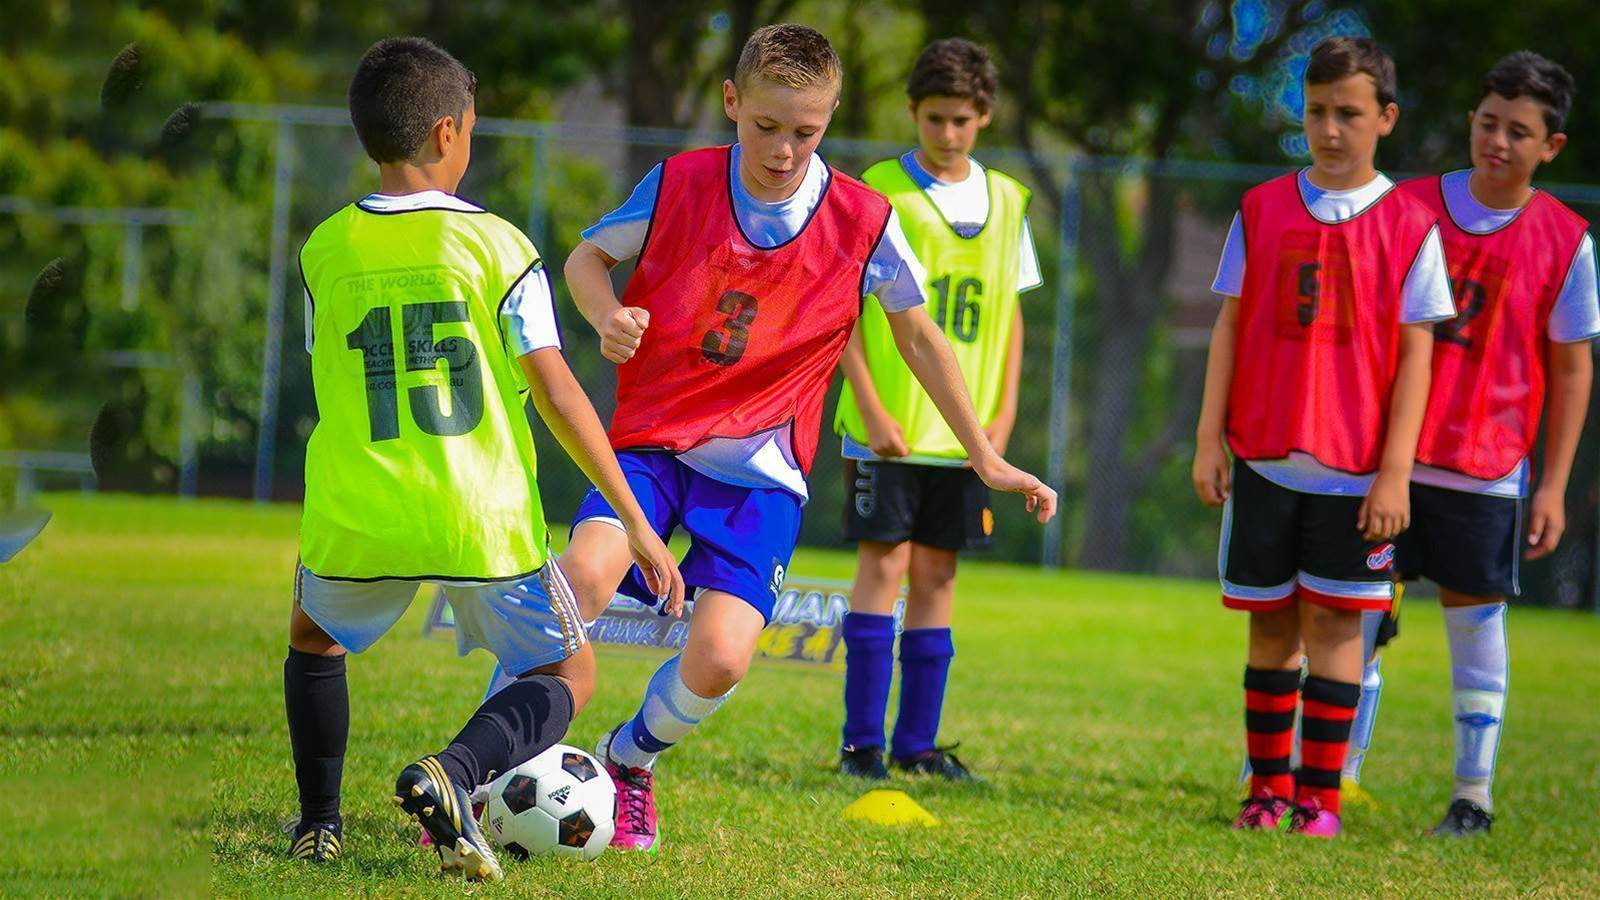 Football grows but funding falls short